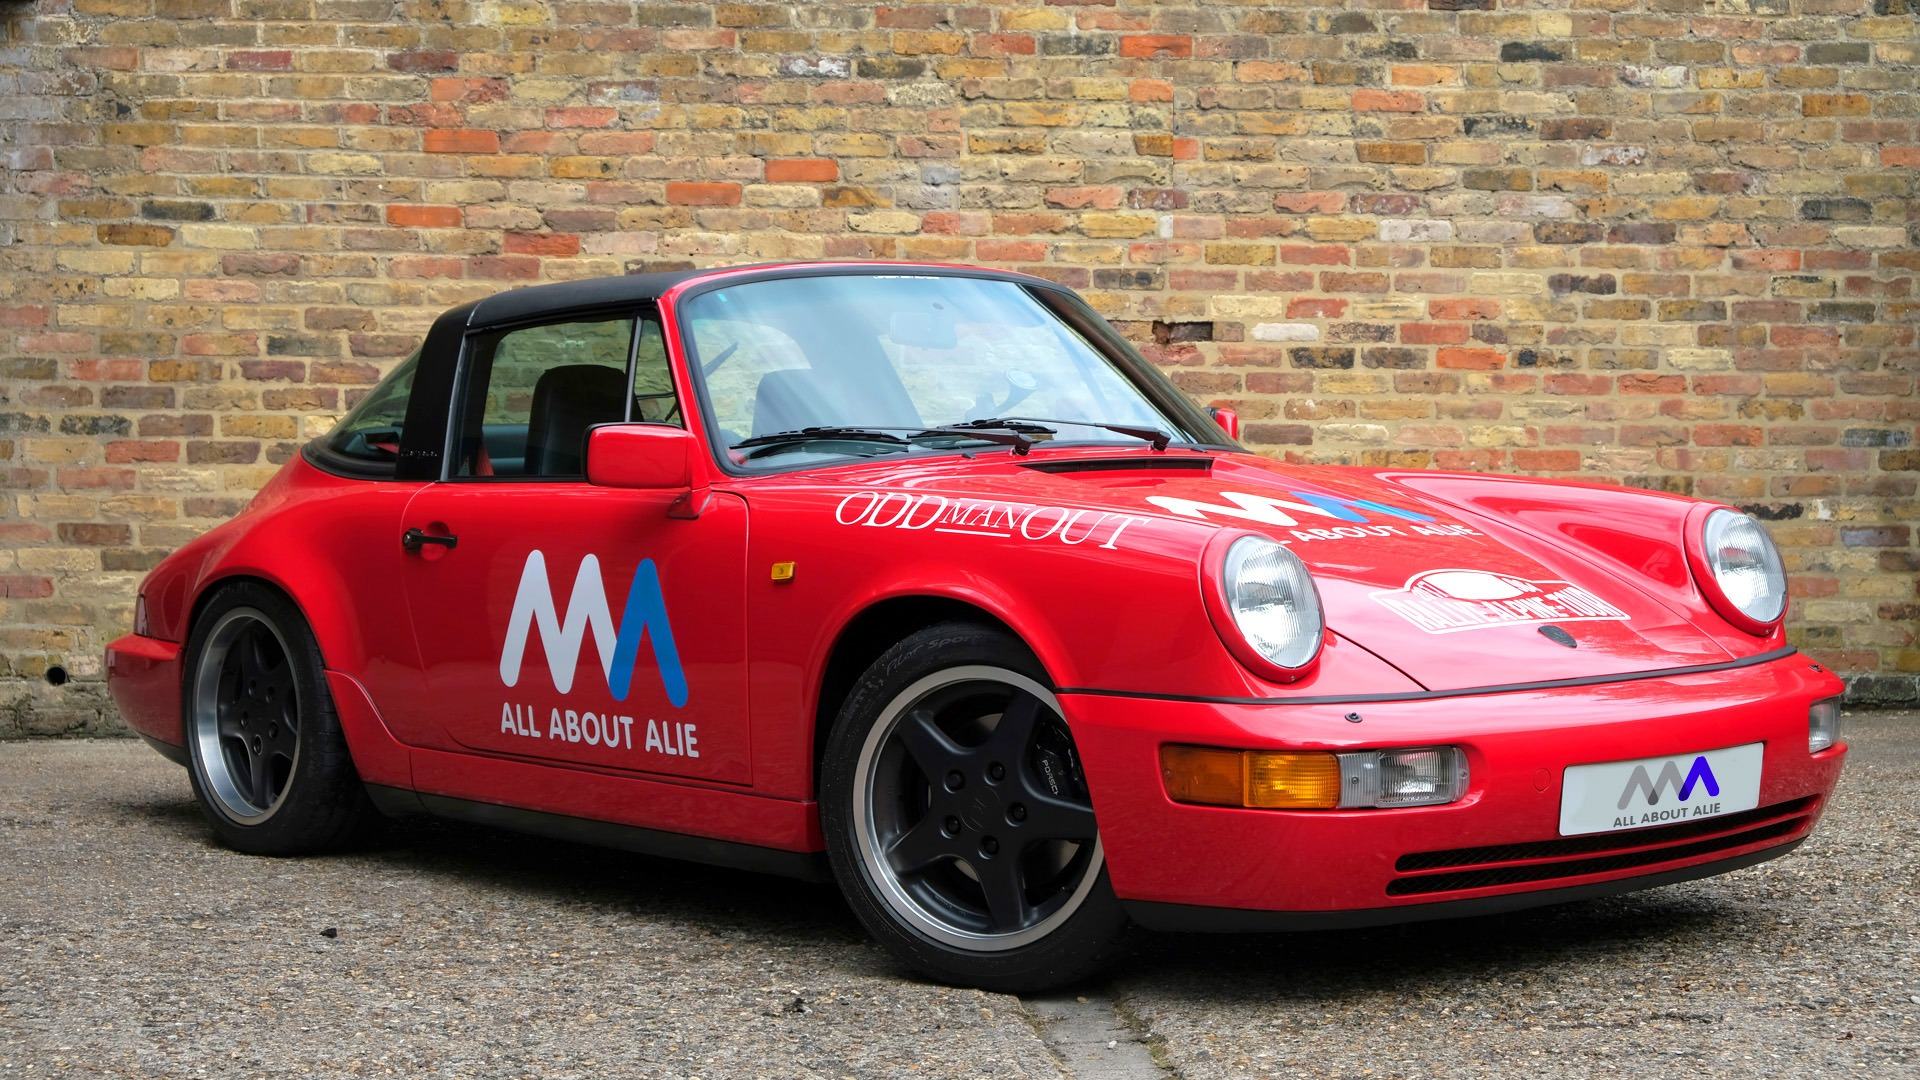 Charity fundraising in a Porsche 964 Targa